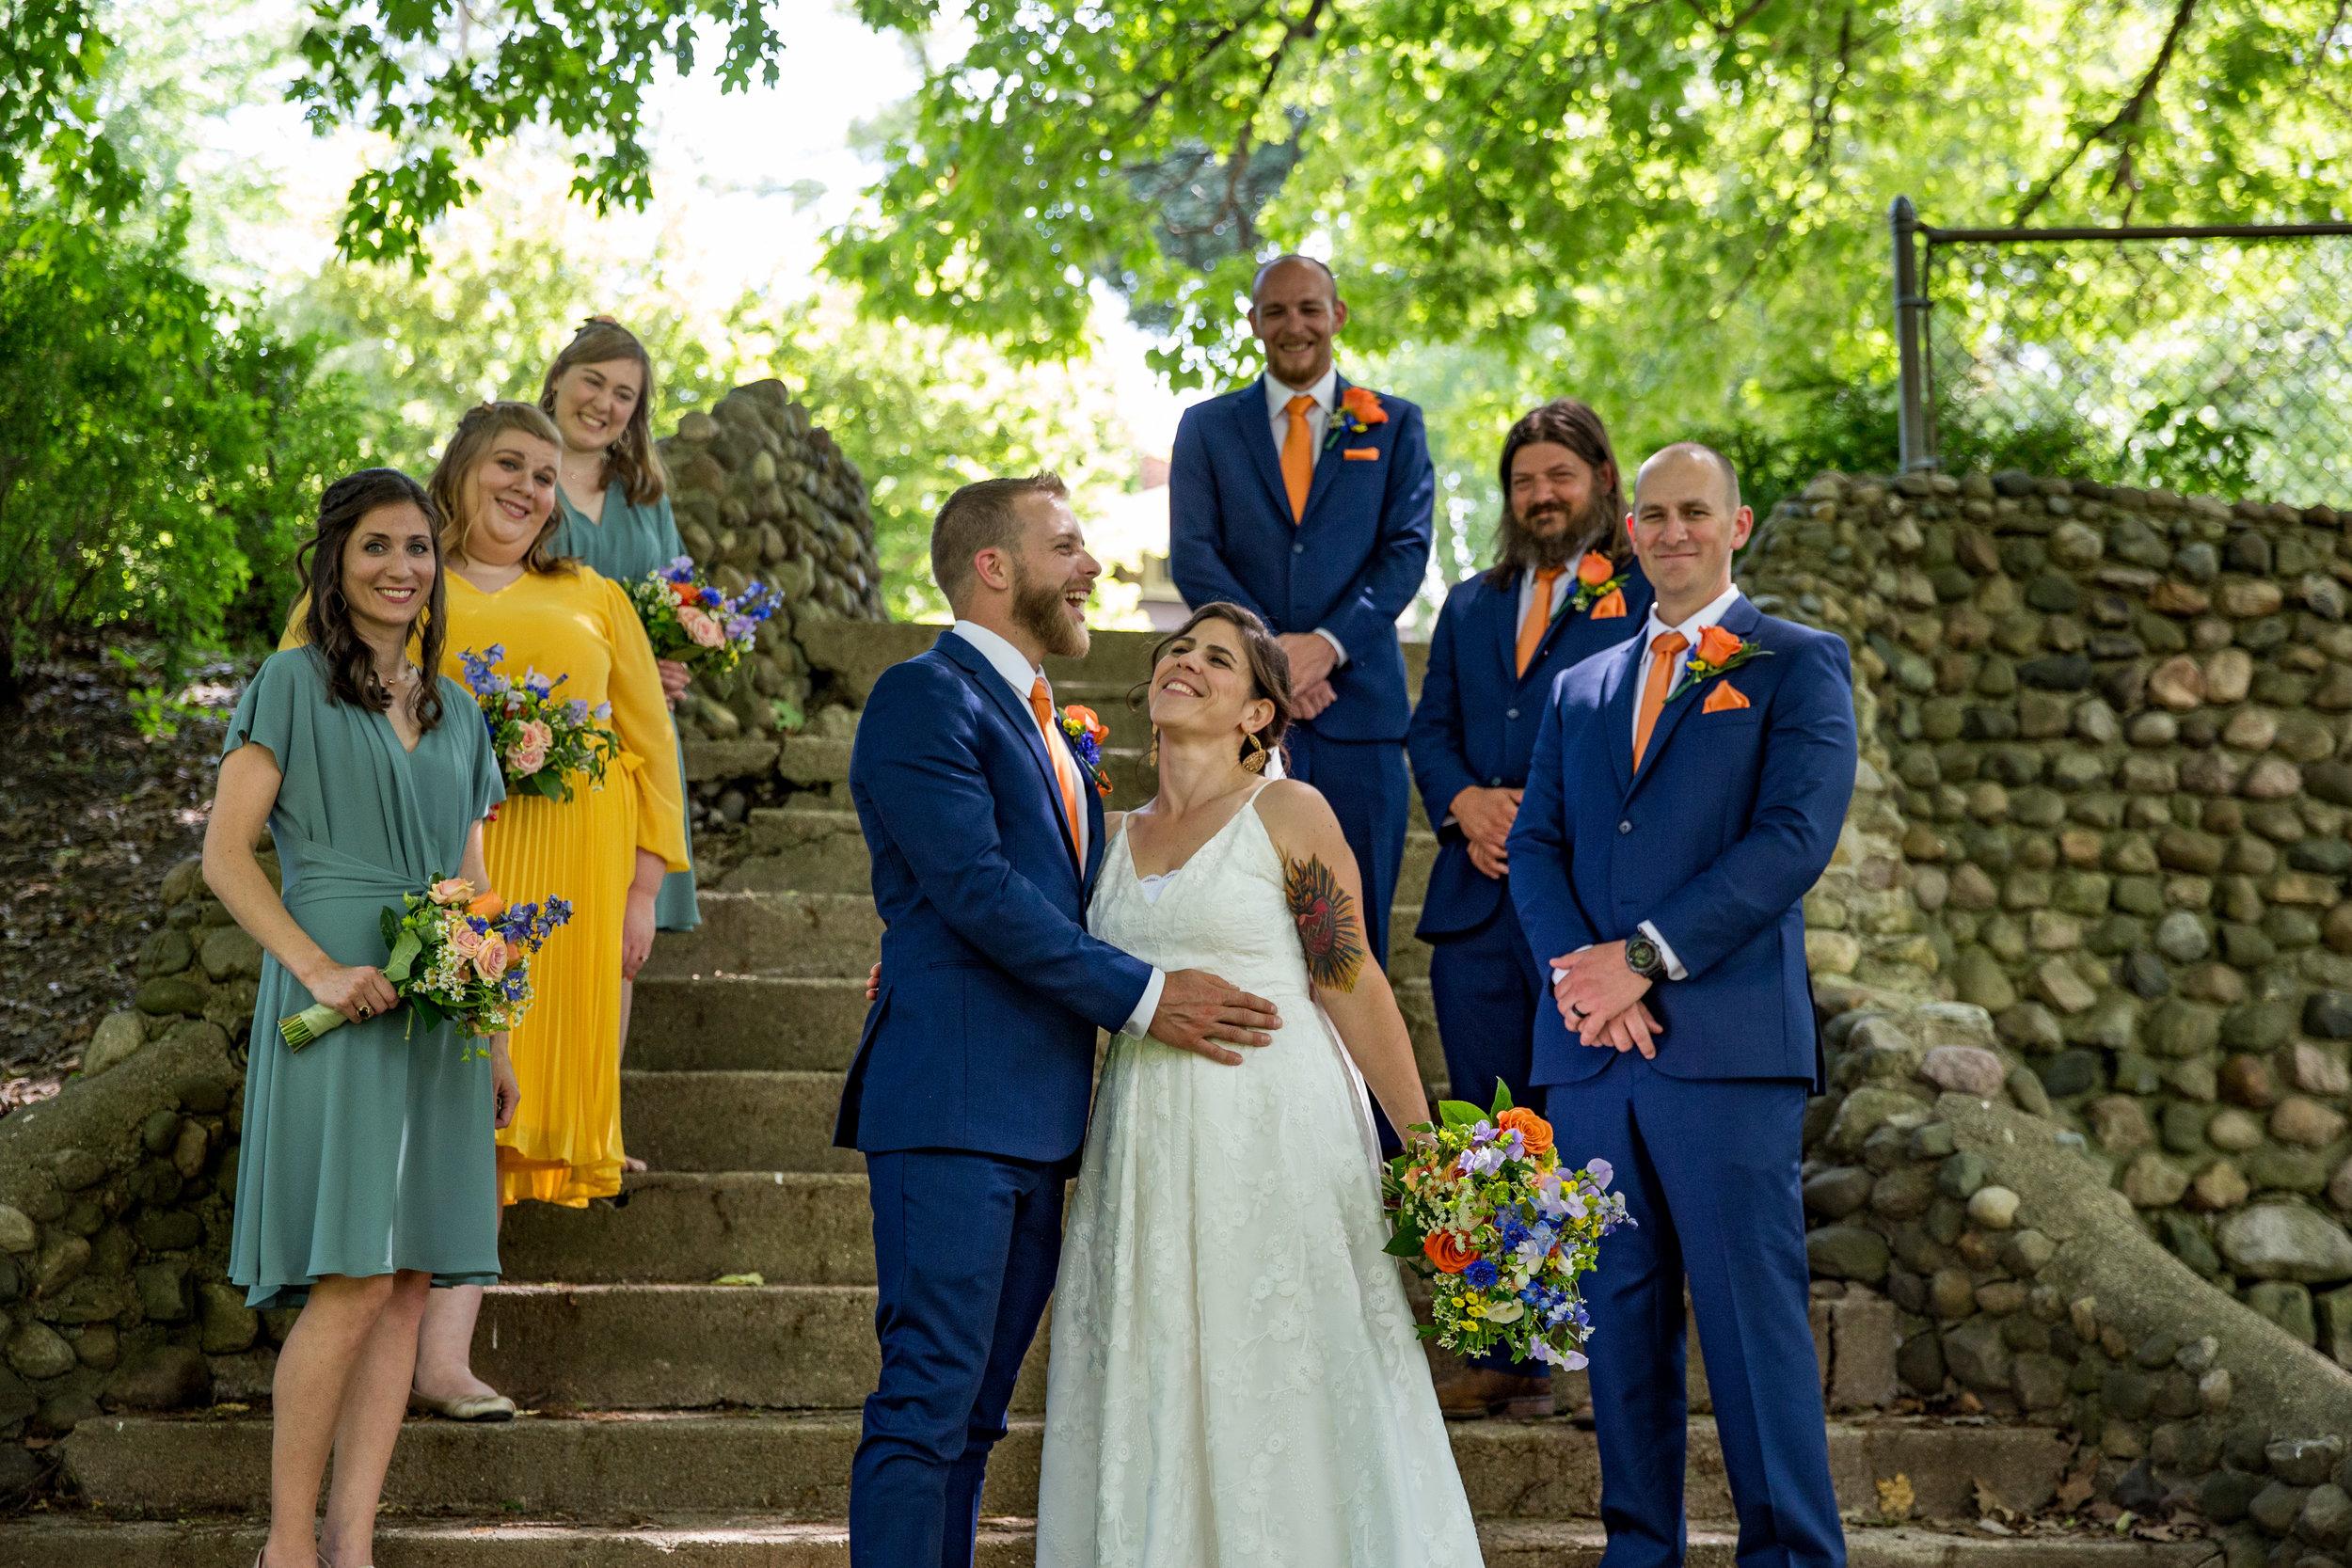 Natalie and Dallas Mooney Wedding 6-8-19_Tania Watt Photography-301.jpg